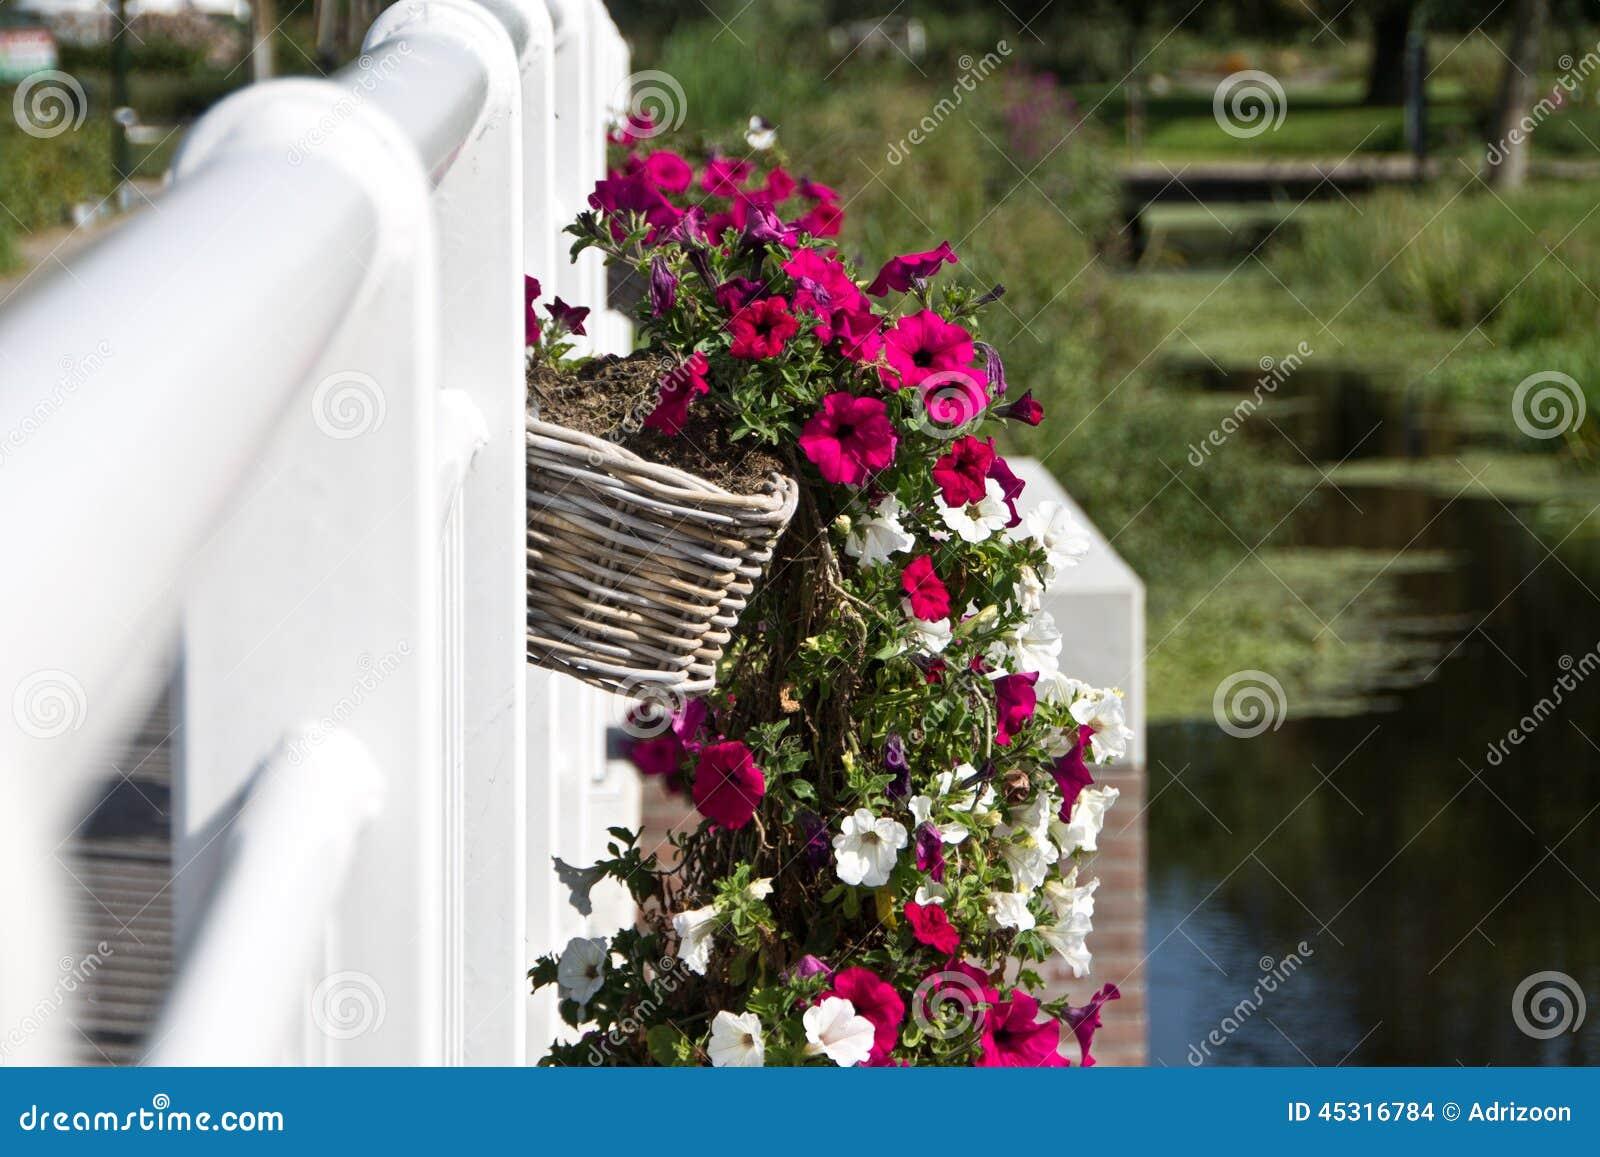 Hanging Flower Baskets Railings : Flower baskets hanging on the railing of a bridge stock